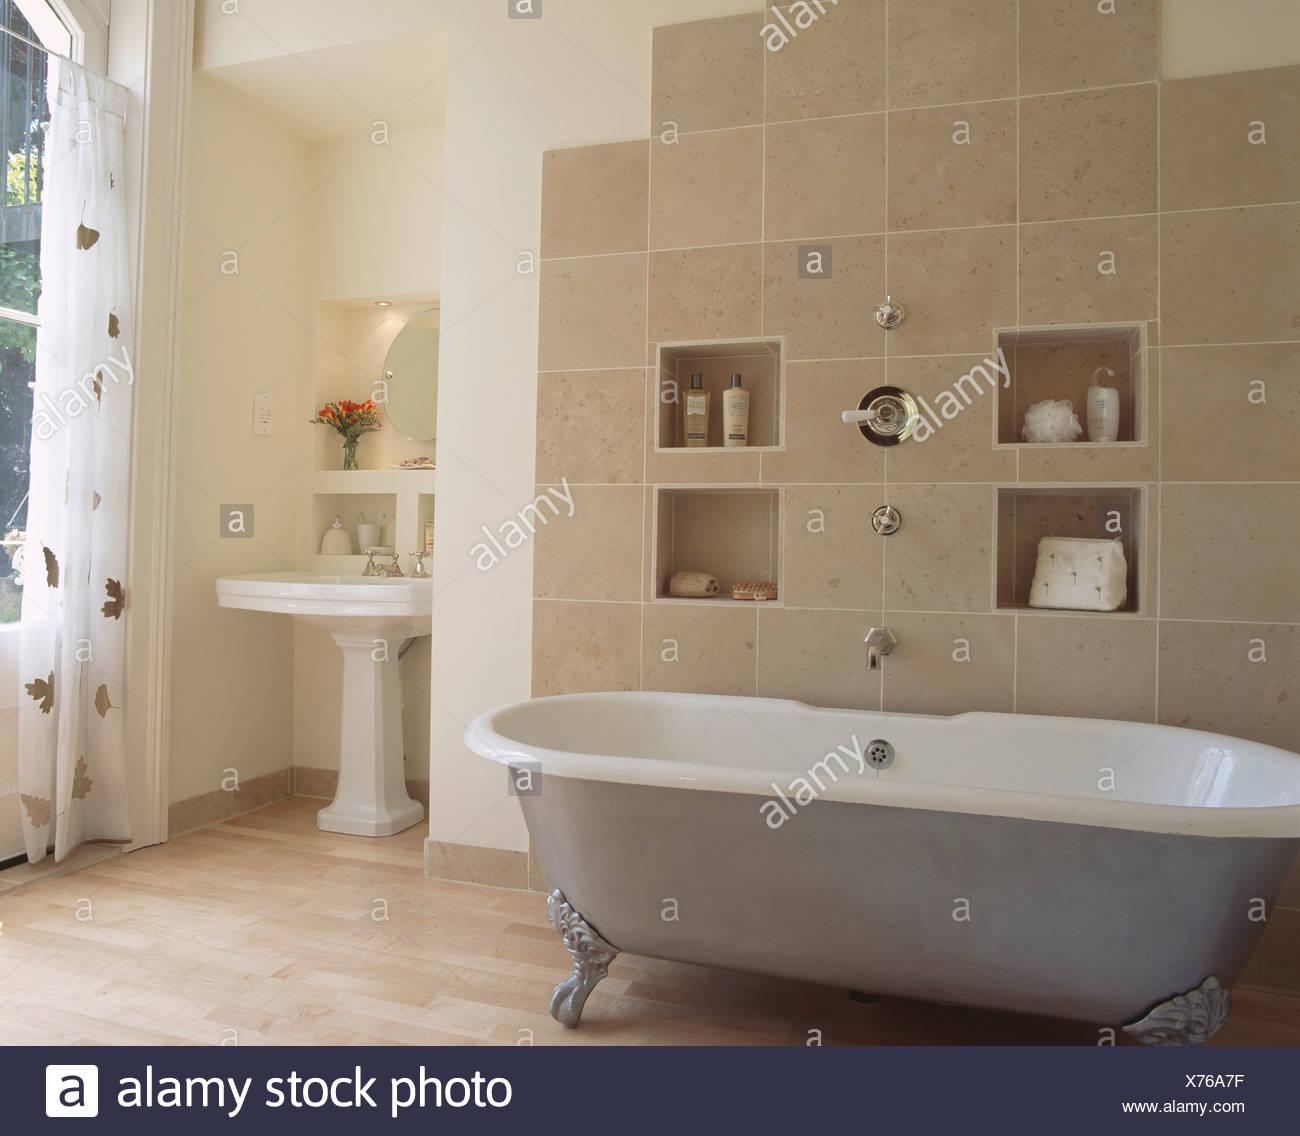 Alcove shelving on beige tiled wall behind metallic clawfoot bath in ...